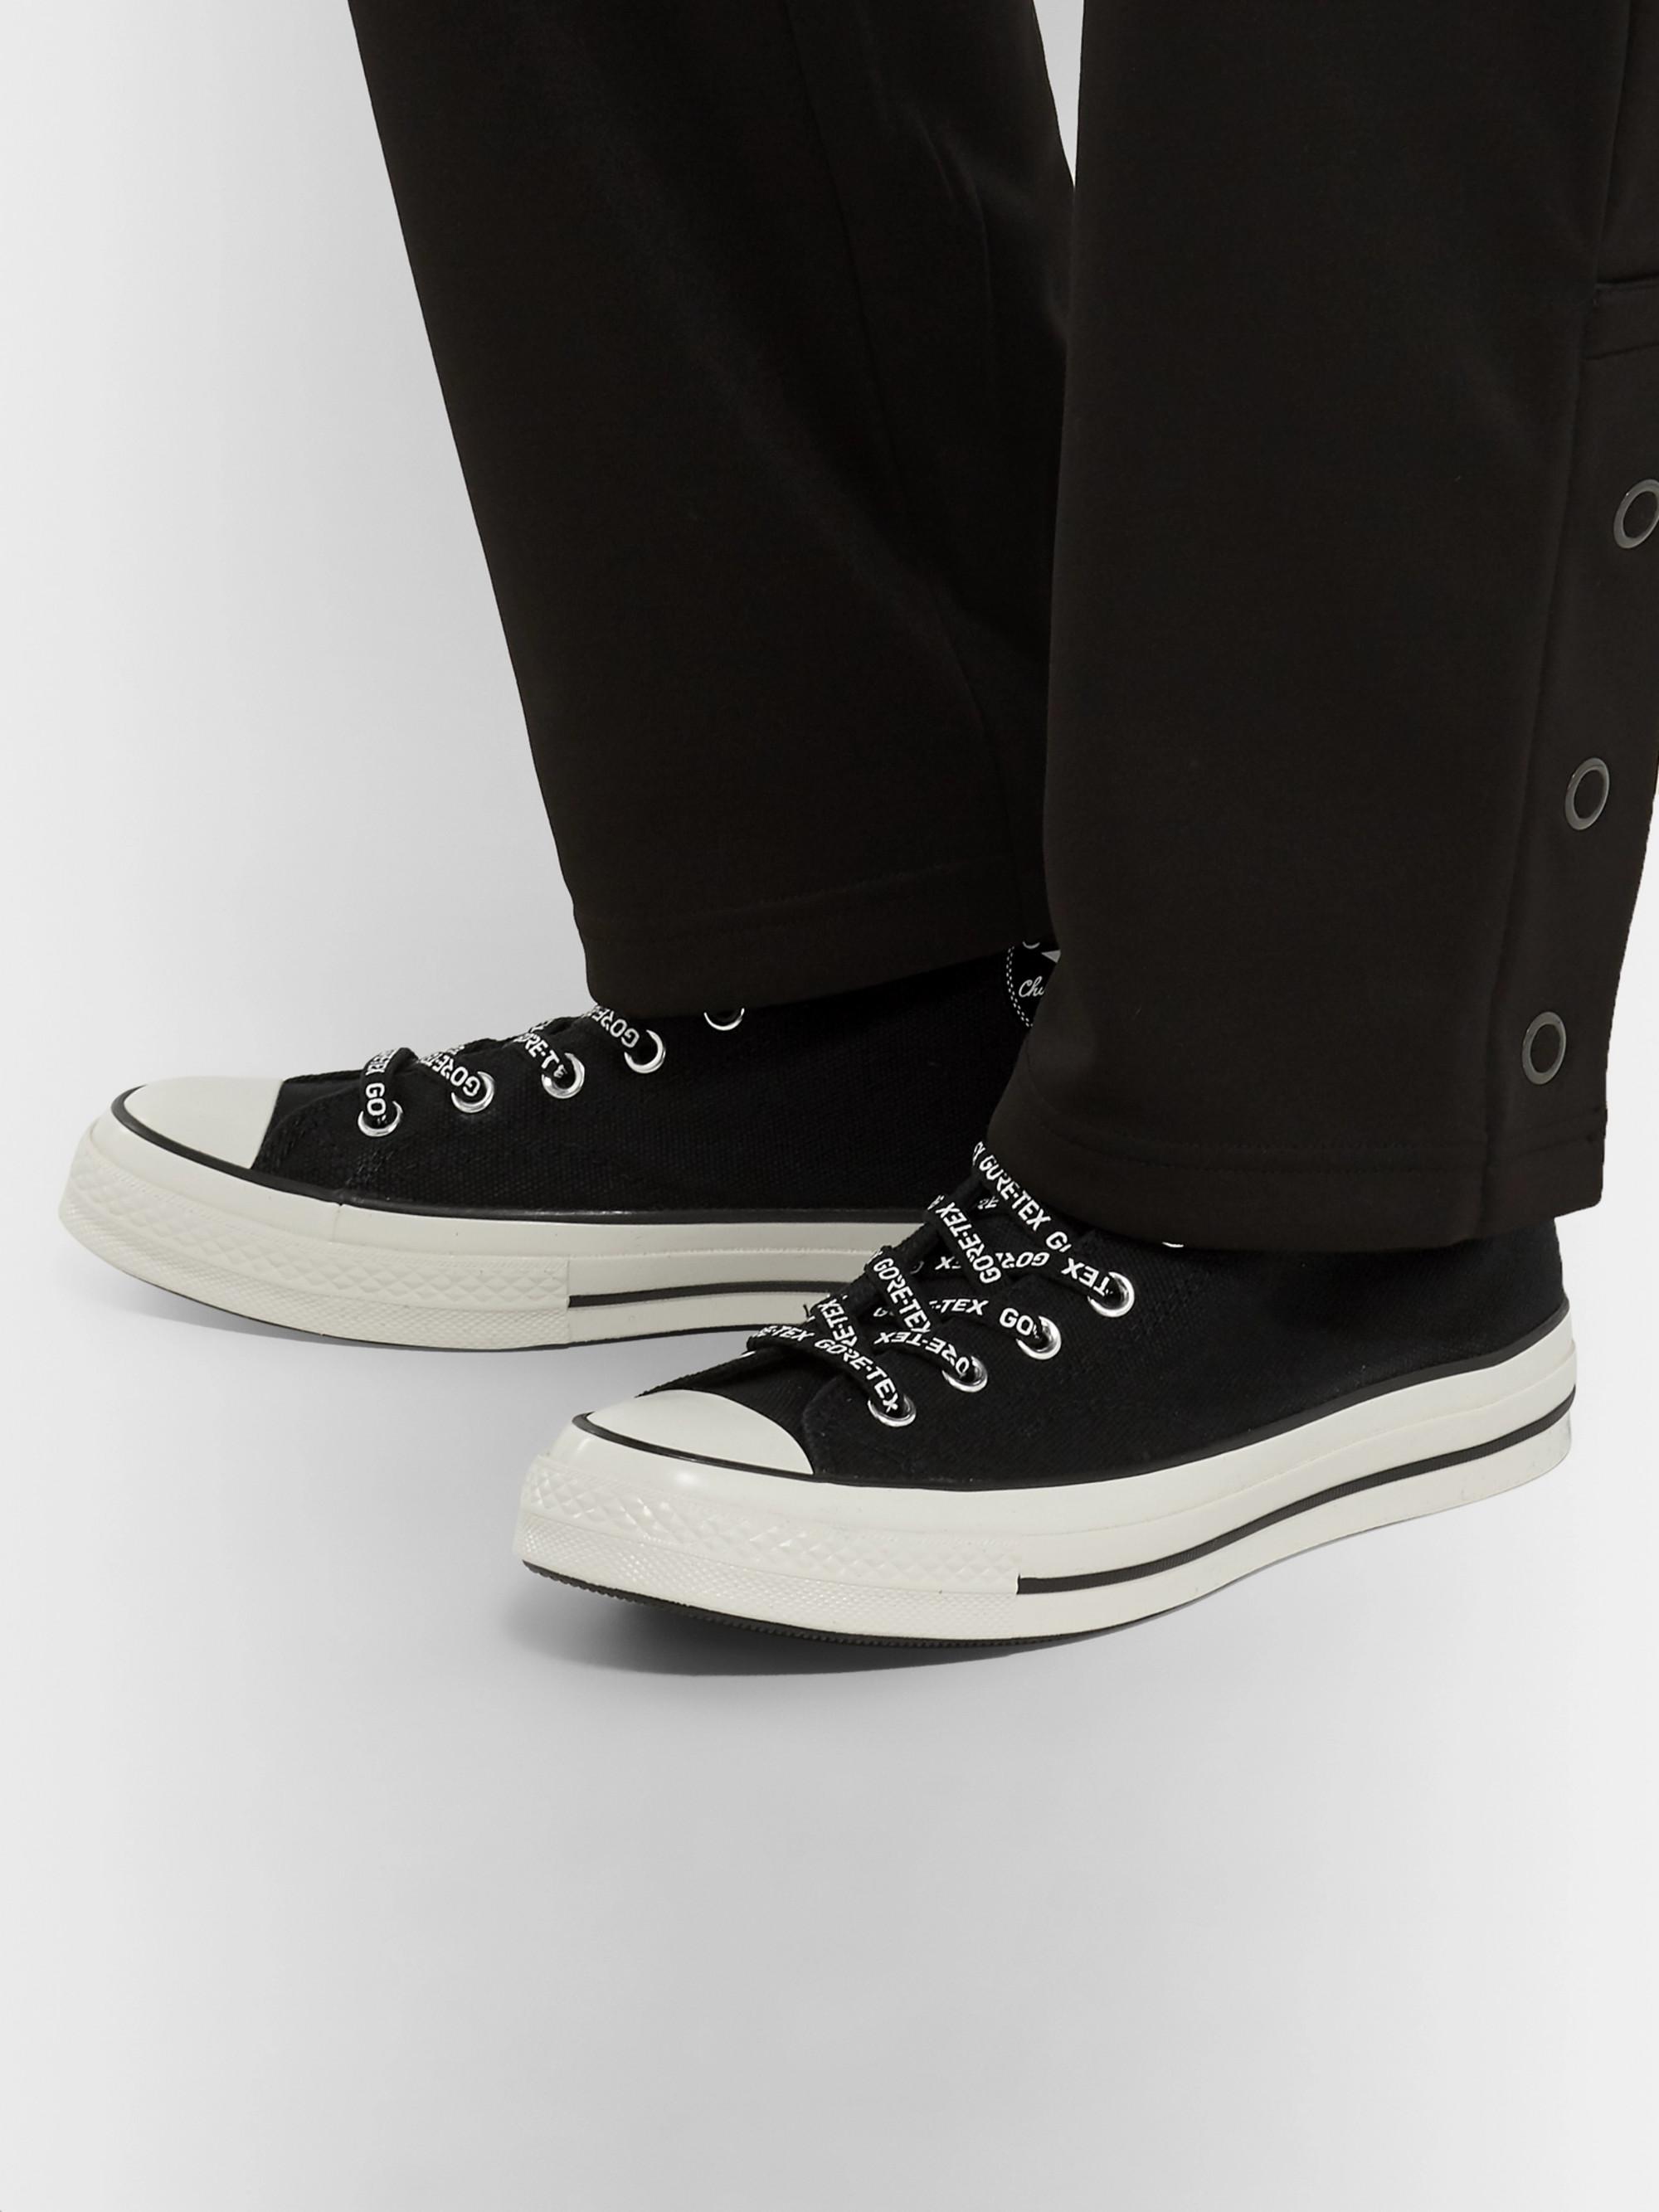 3749f49fd34 Black Chuck 70 GORE-TEX High-Top Sneakers   Converse   MR PORTER